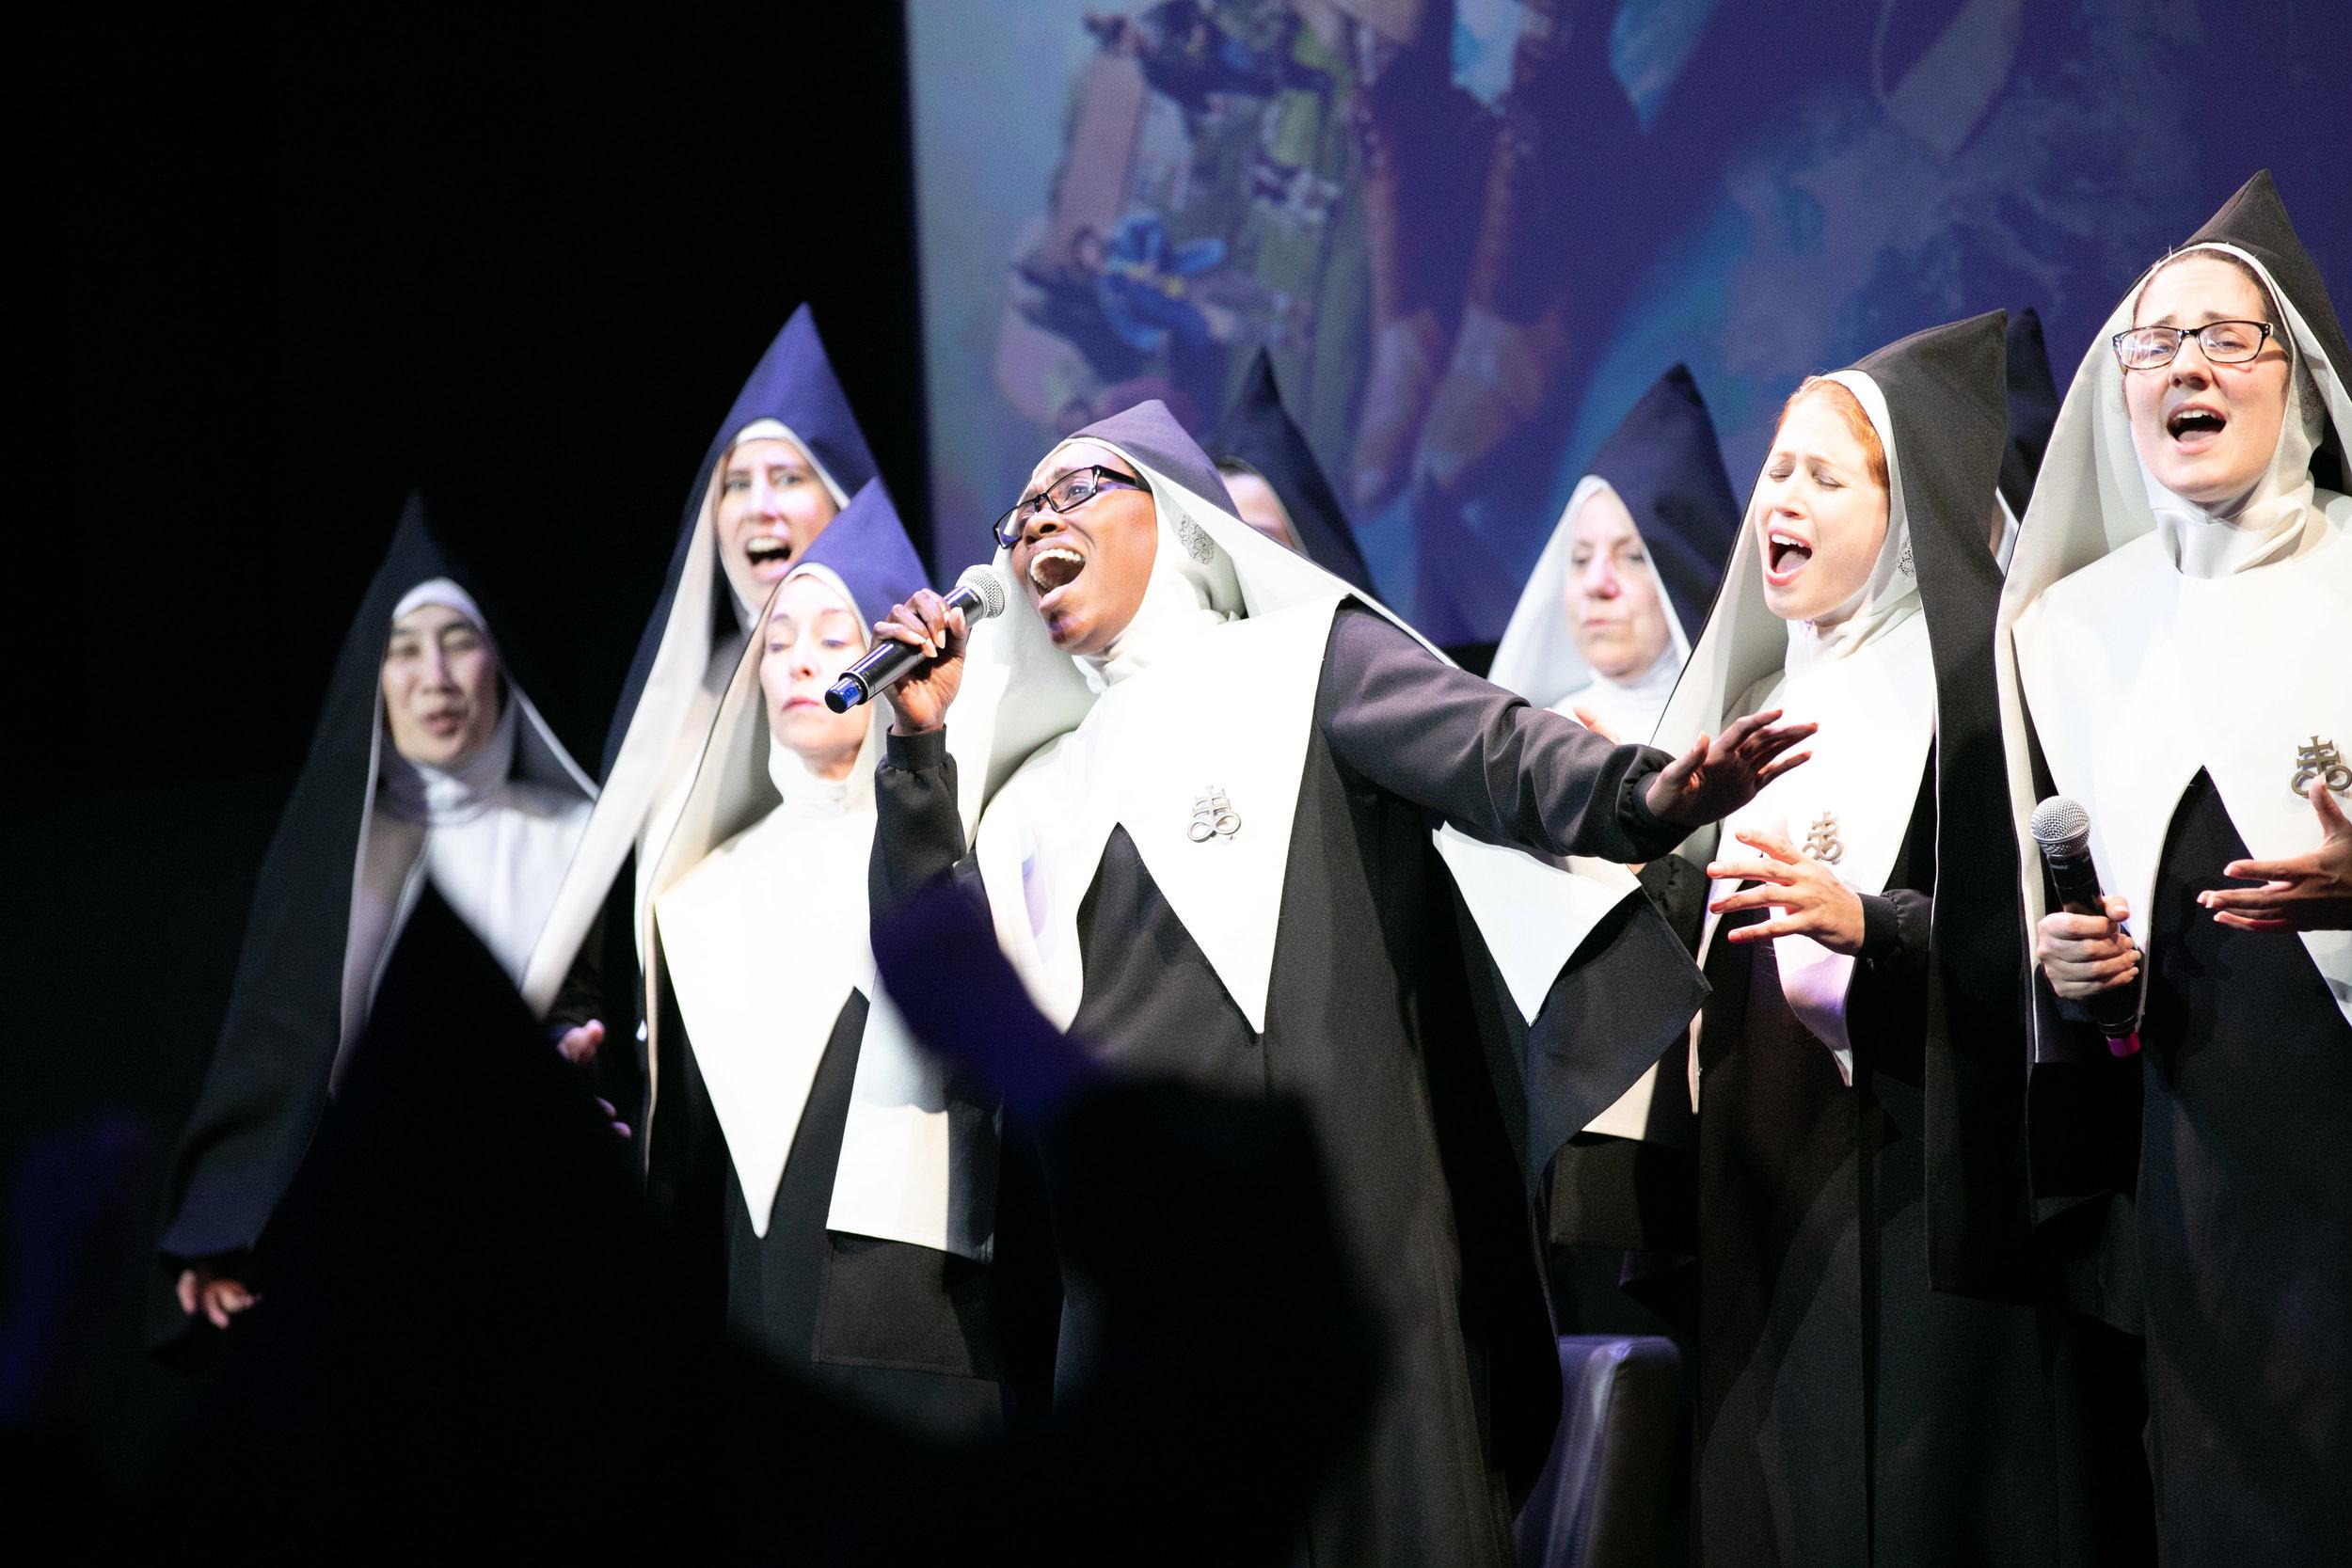 2 Good omens chattering nuns hal kirkland.jpg